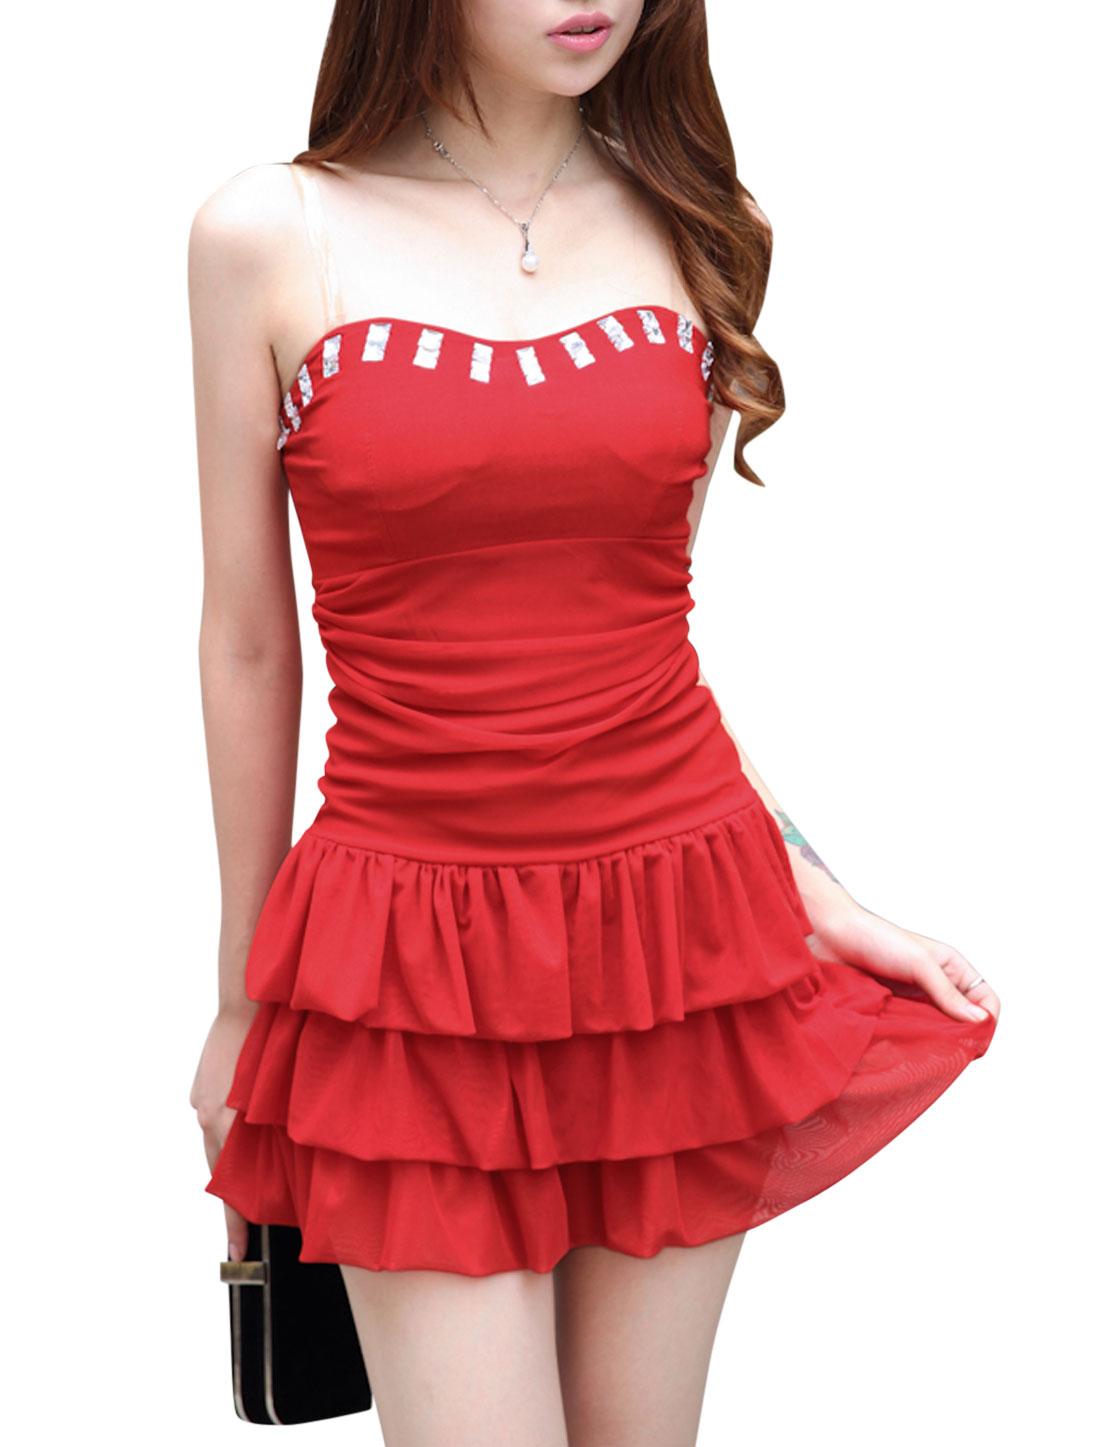 Women Sweetheart Neckline Sleeveless Mesh Panel Sexy Corset Dress Red XS